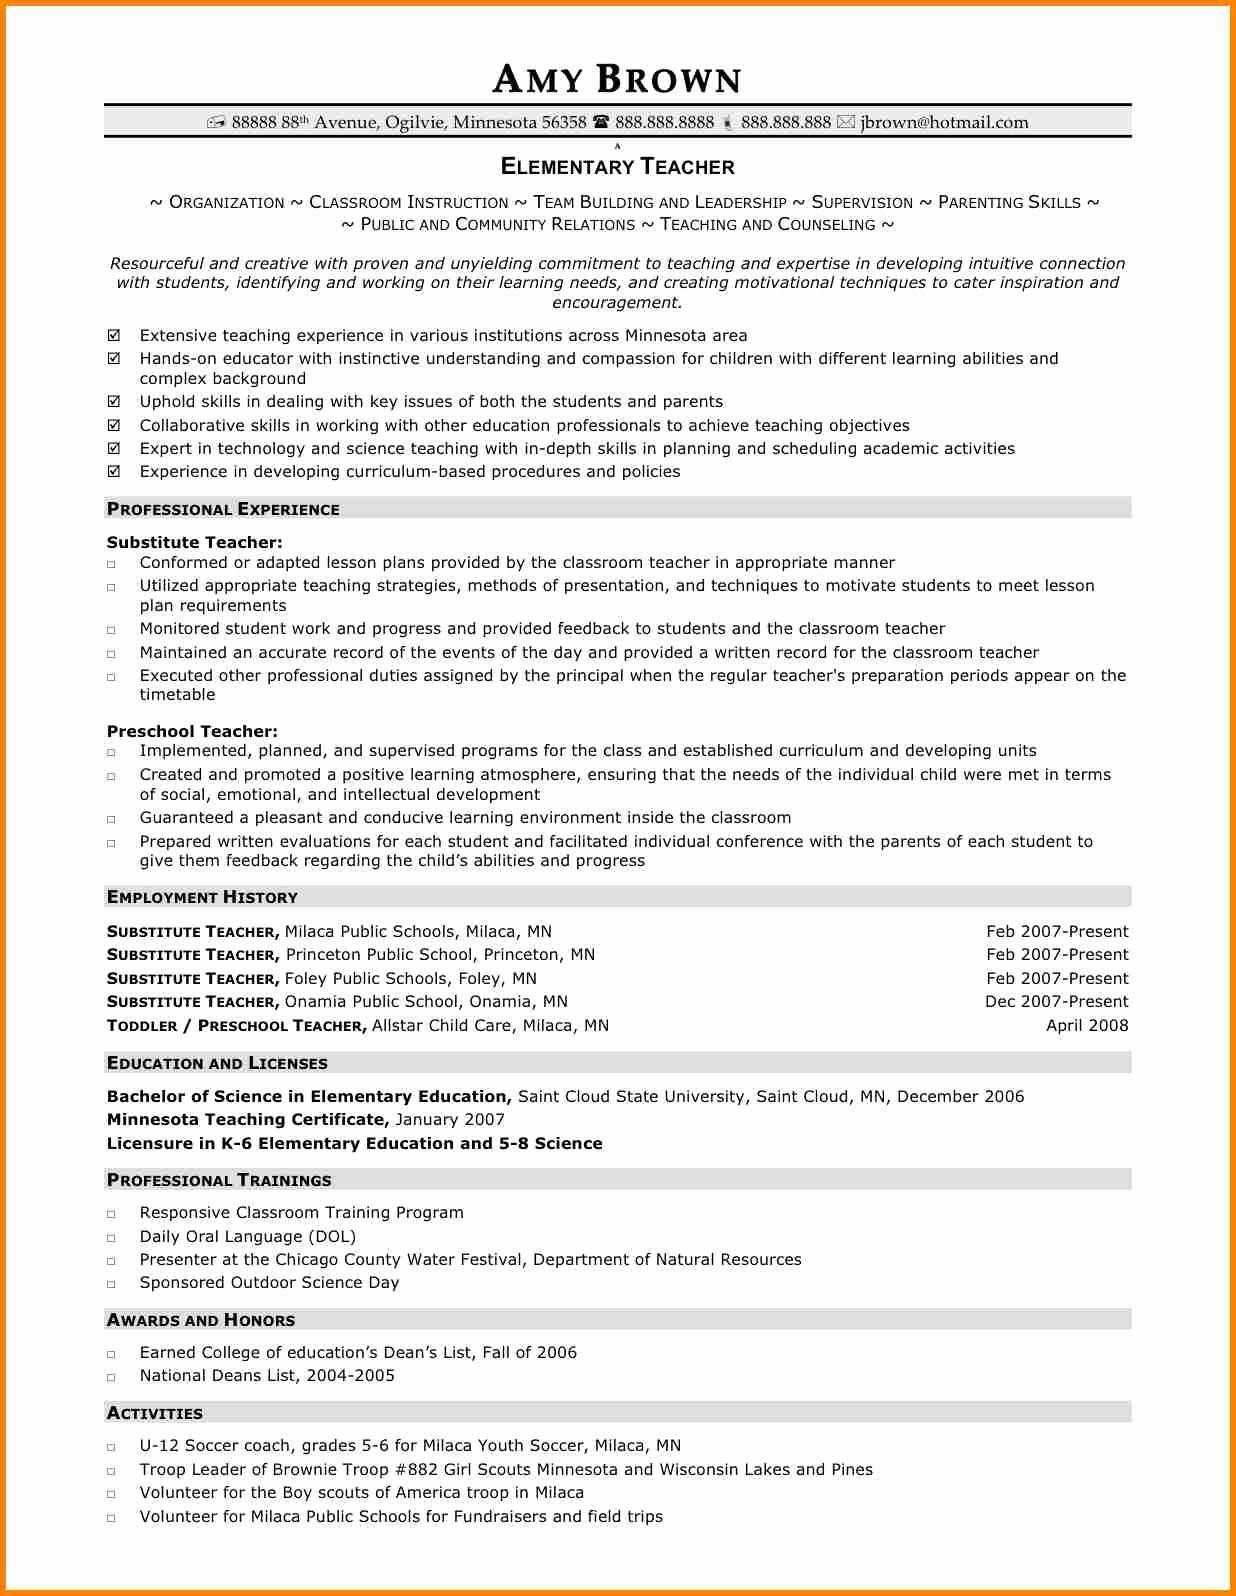 Teacher Resume Template Free Download Elegant 7 Elementary Teacher Resume Templates